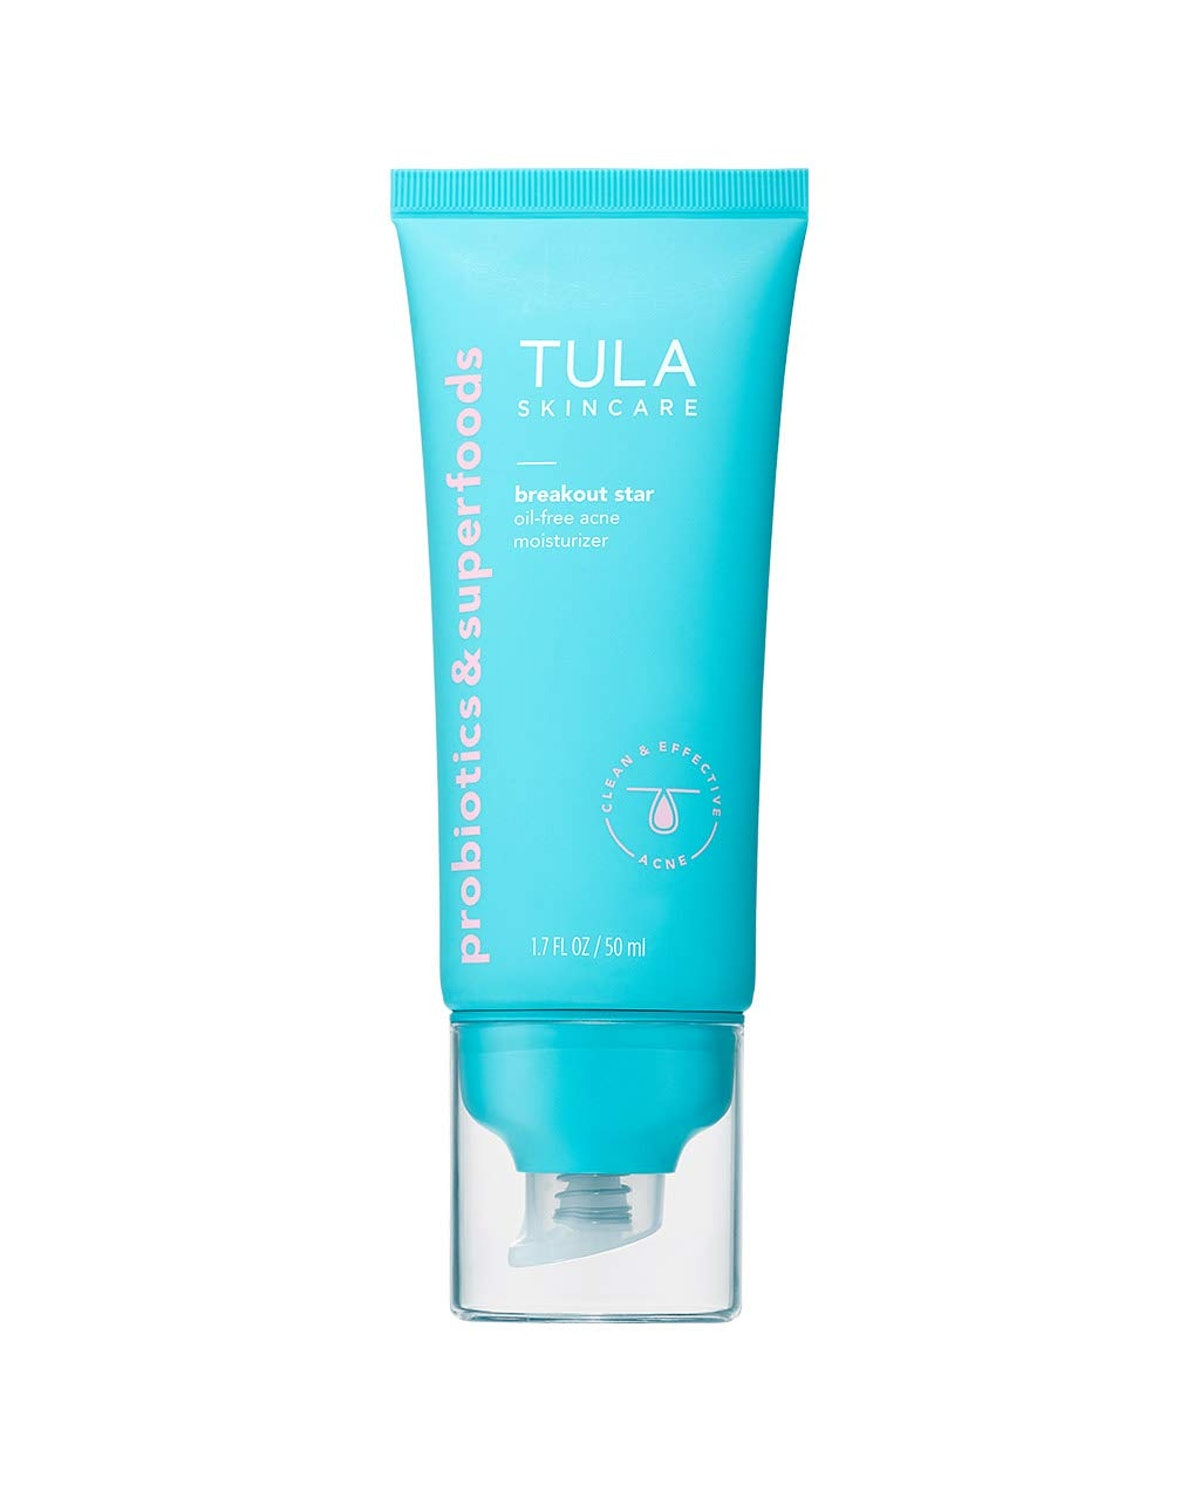 TULA Skincare Breakout Star Acne Moisturizer